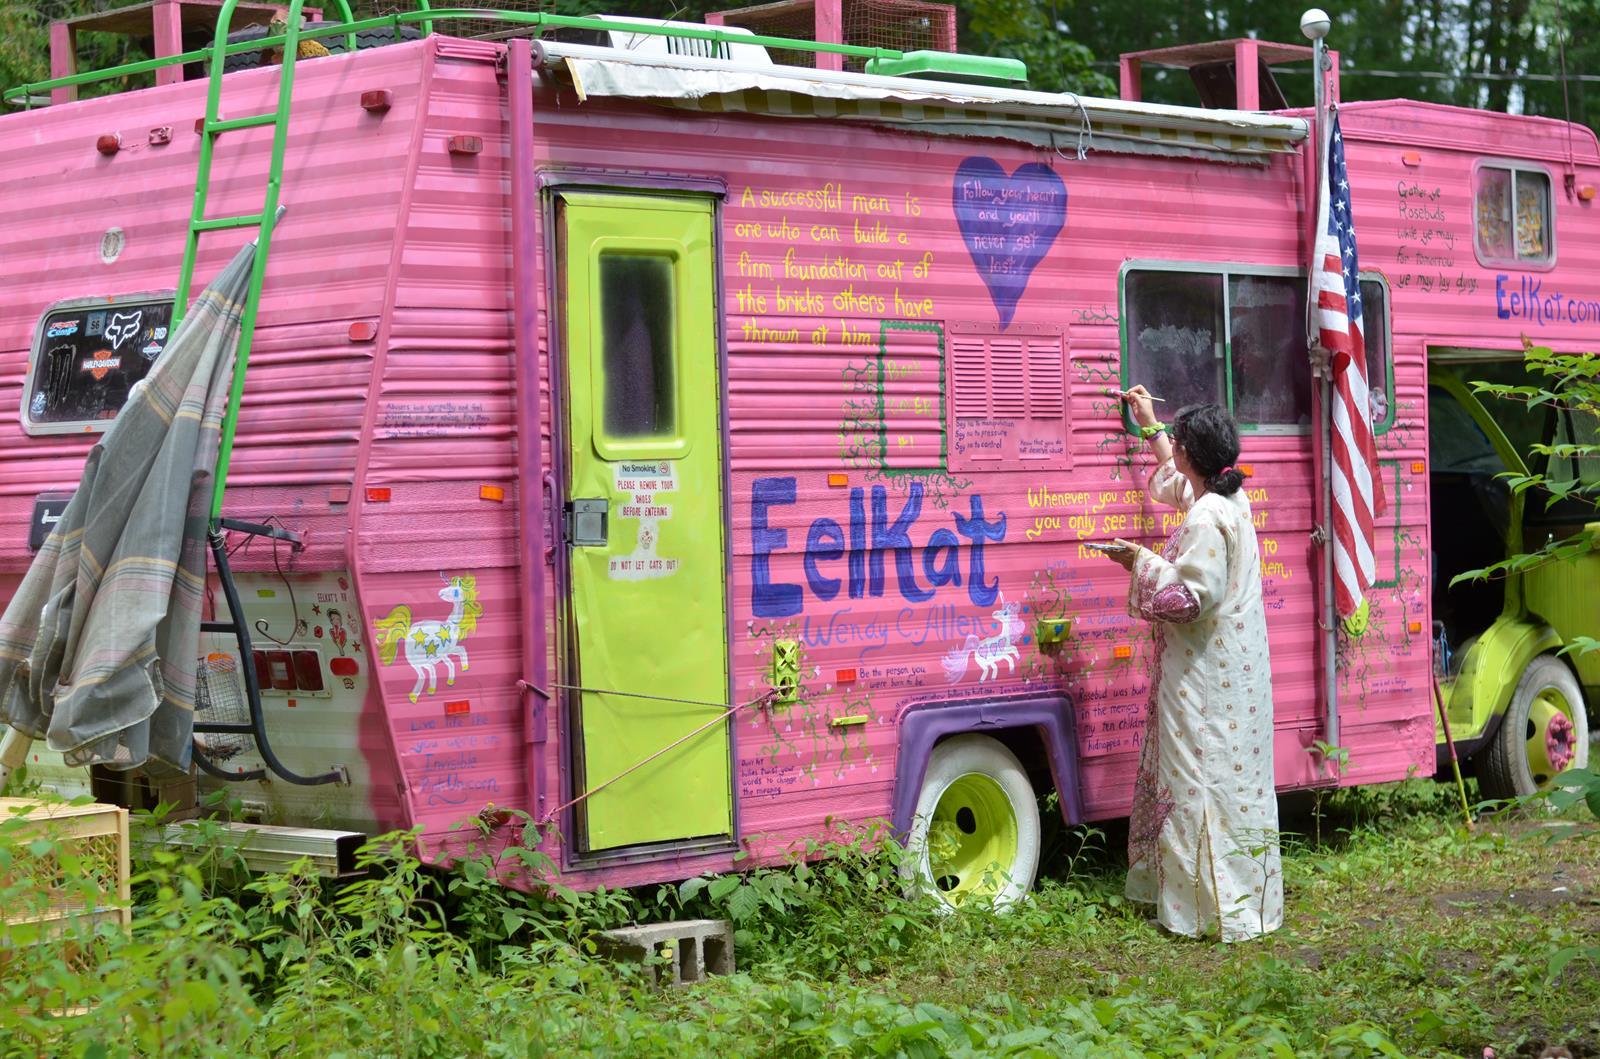 Monster Truck No Hurry as Gypsy Caravan RoseBud - Outside